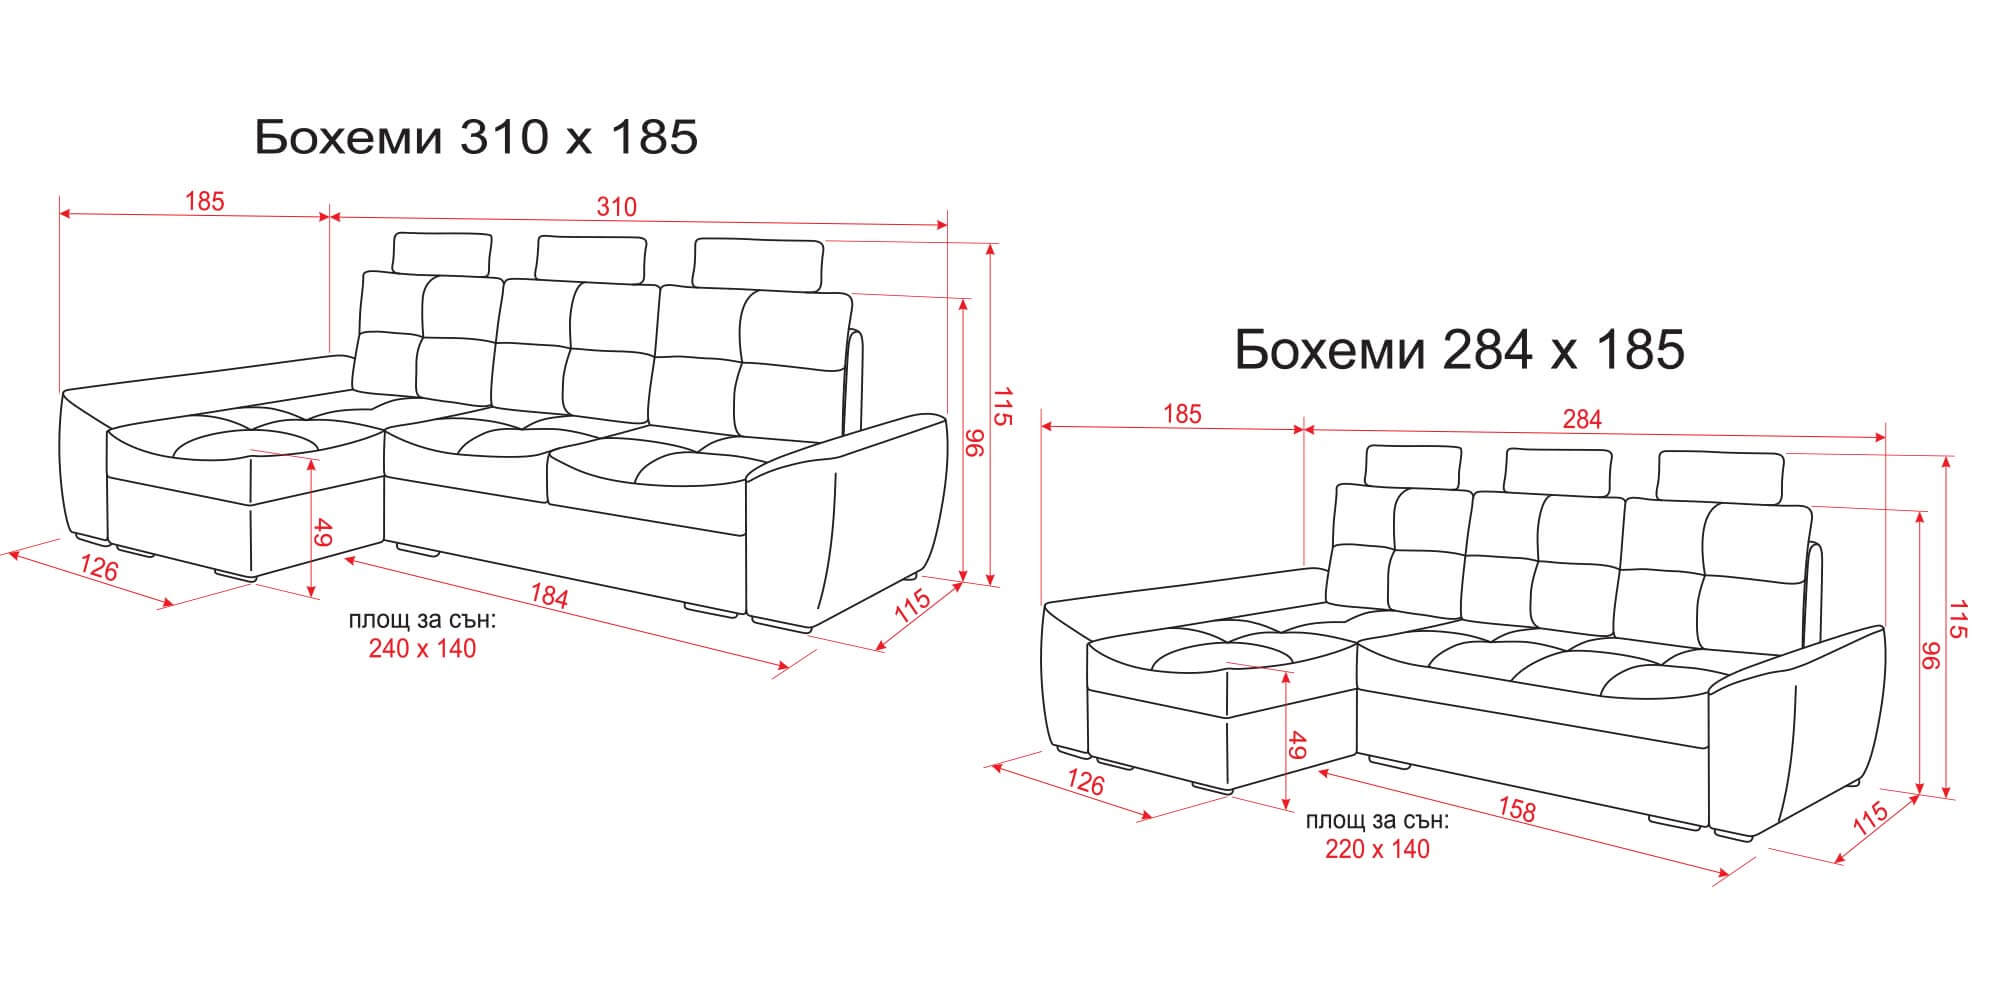 Схема с размери Бохеми